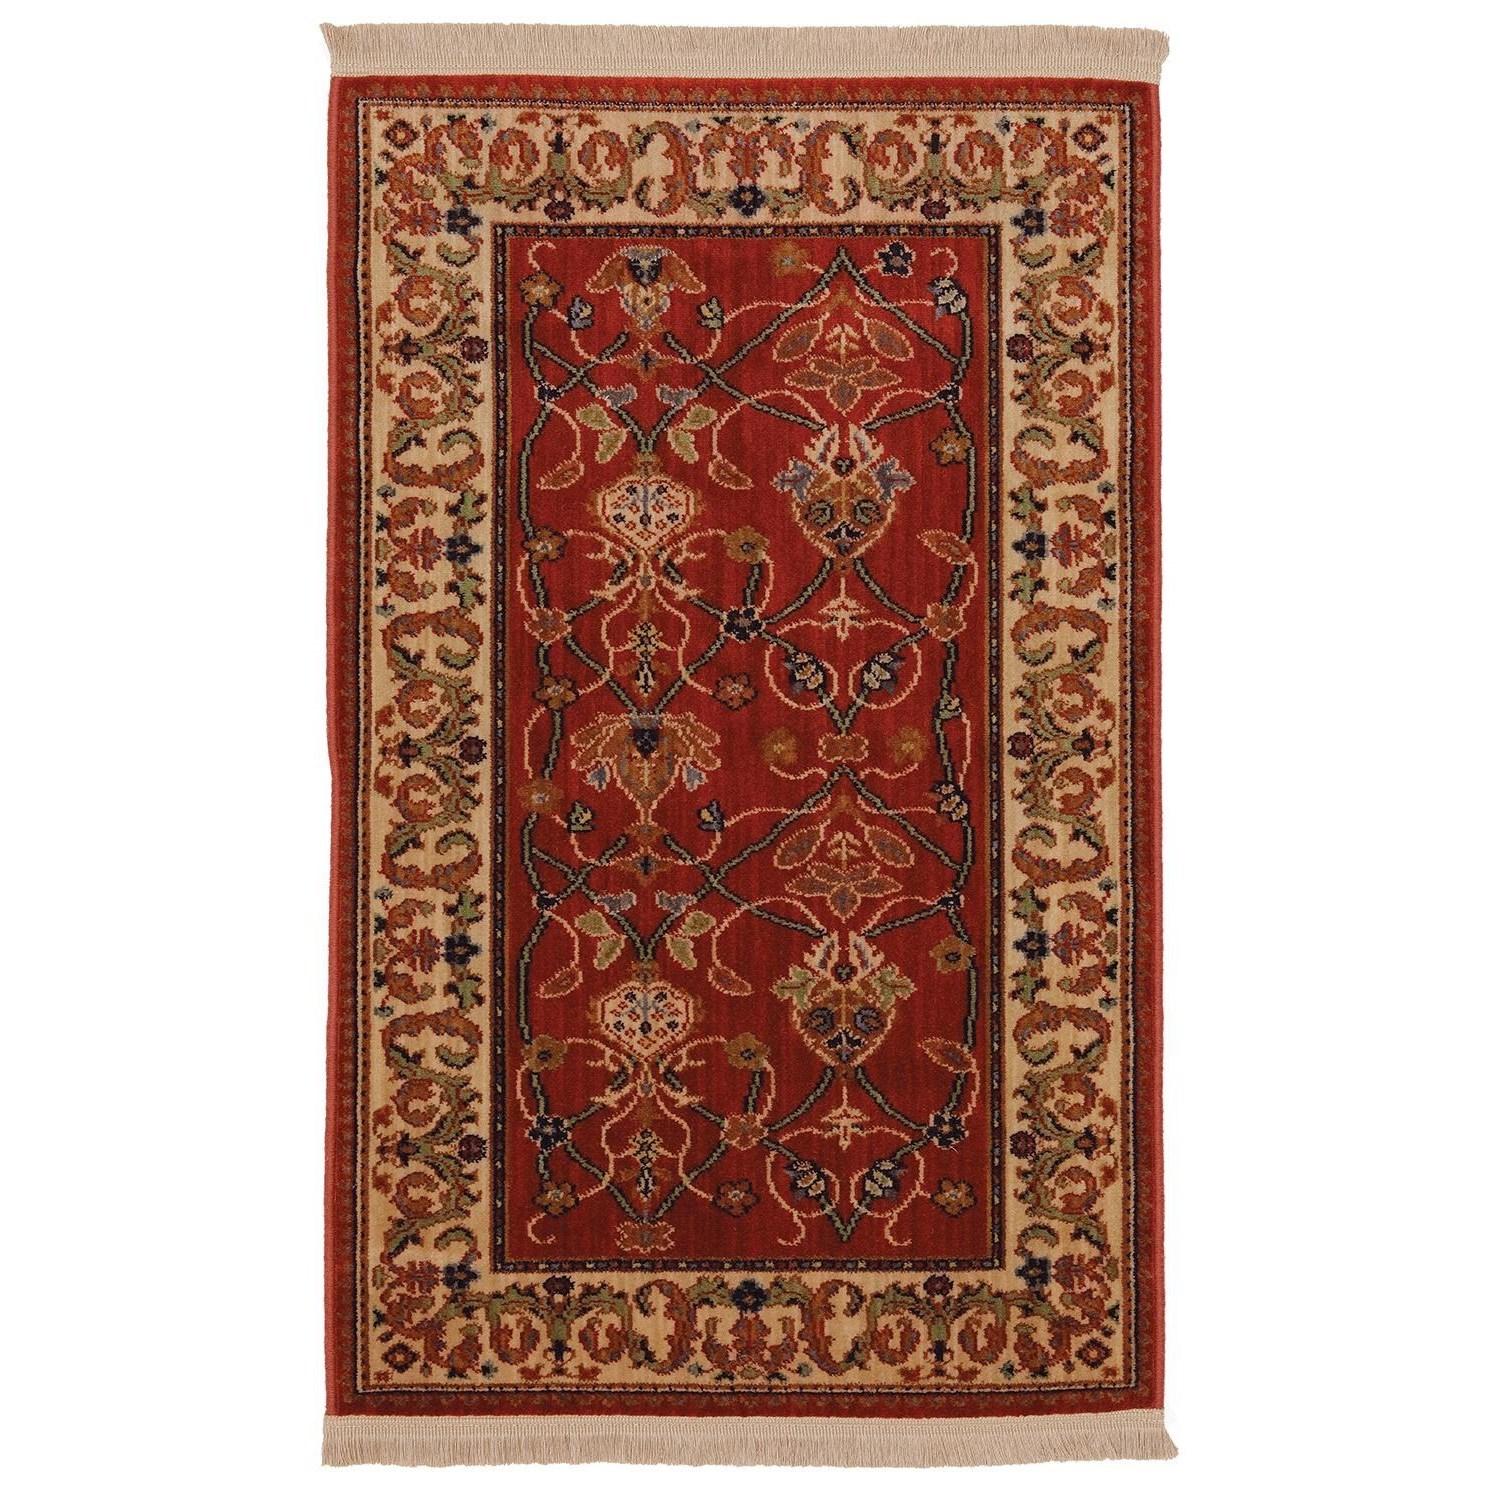 Karastan Rugs English Manor 2'6x4' William Morris Red Rug - Item Number: 02120 00510 030048